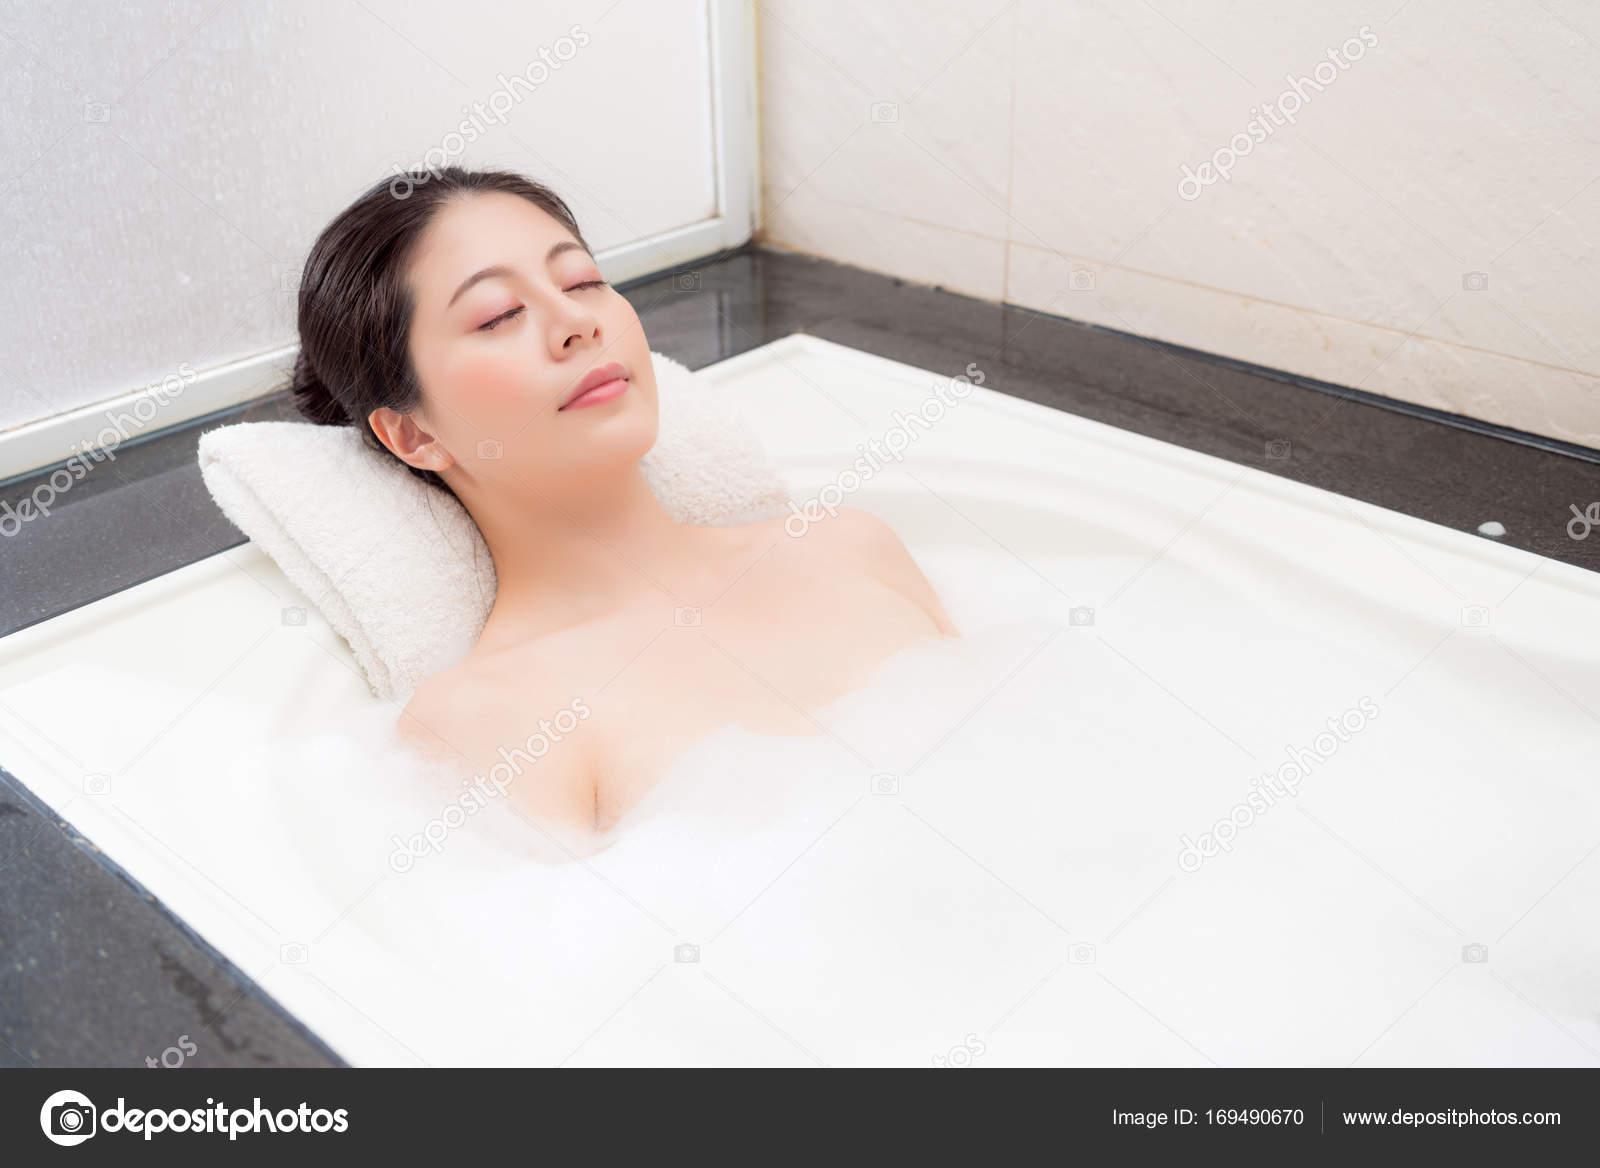 Sweet Pretty Woman Lying Down In Bathtub Sleeping Stock Photo